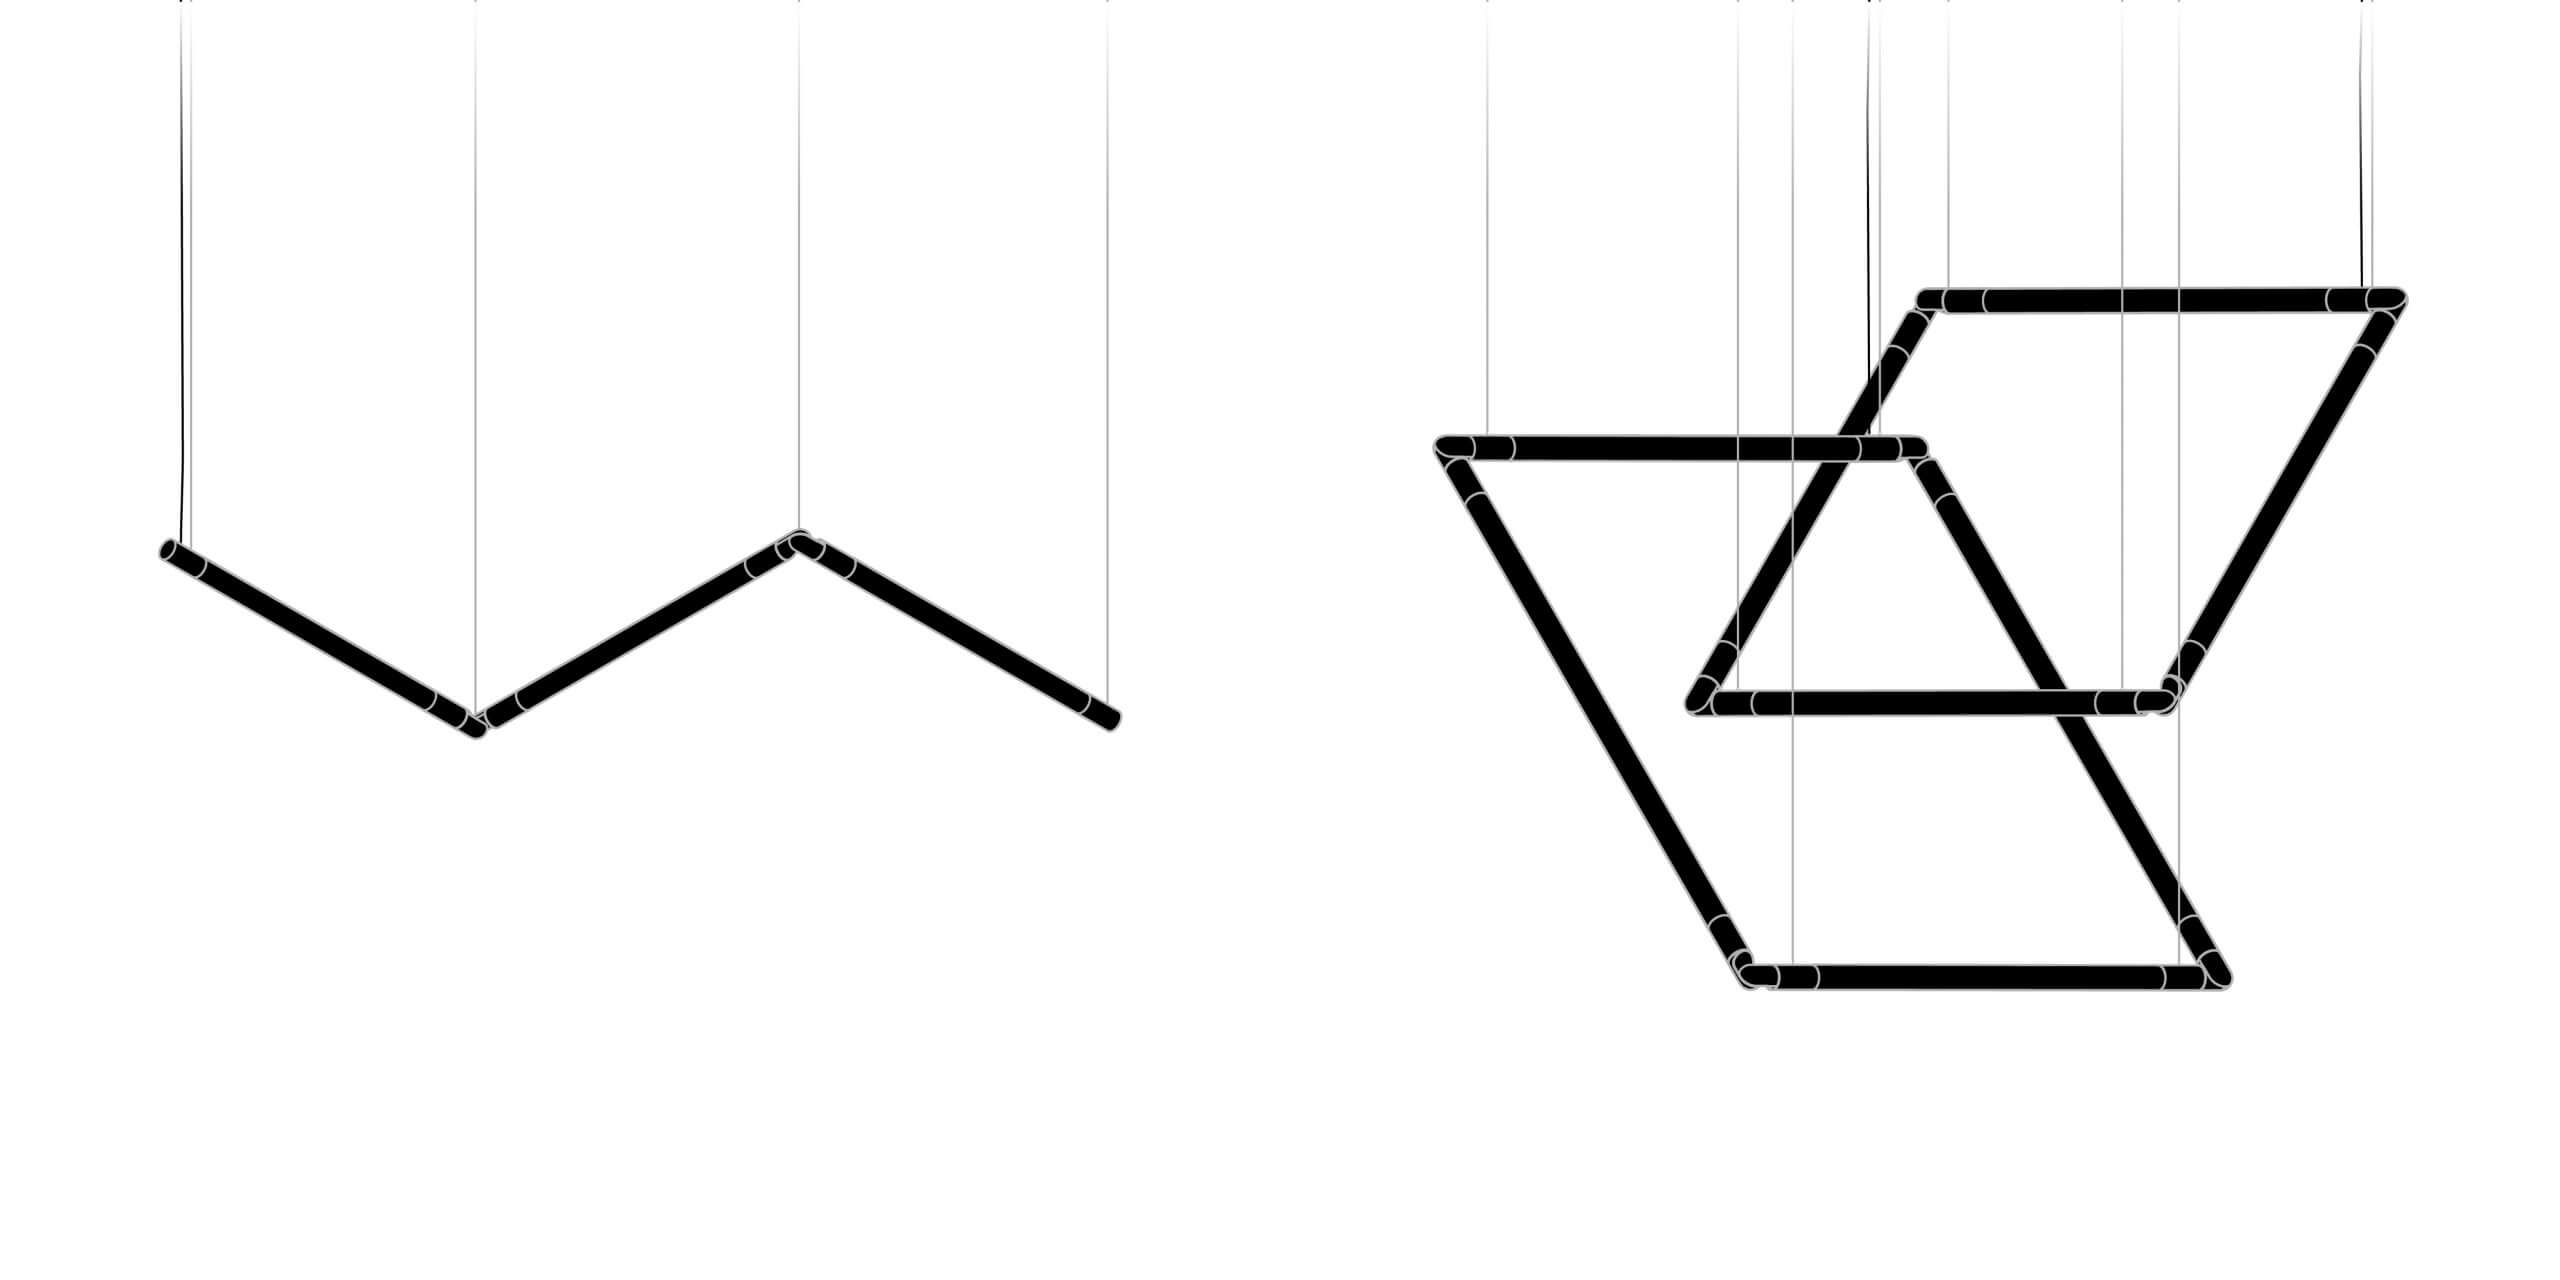 Configurations_2